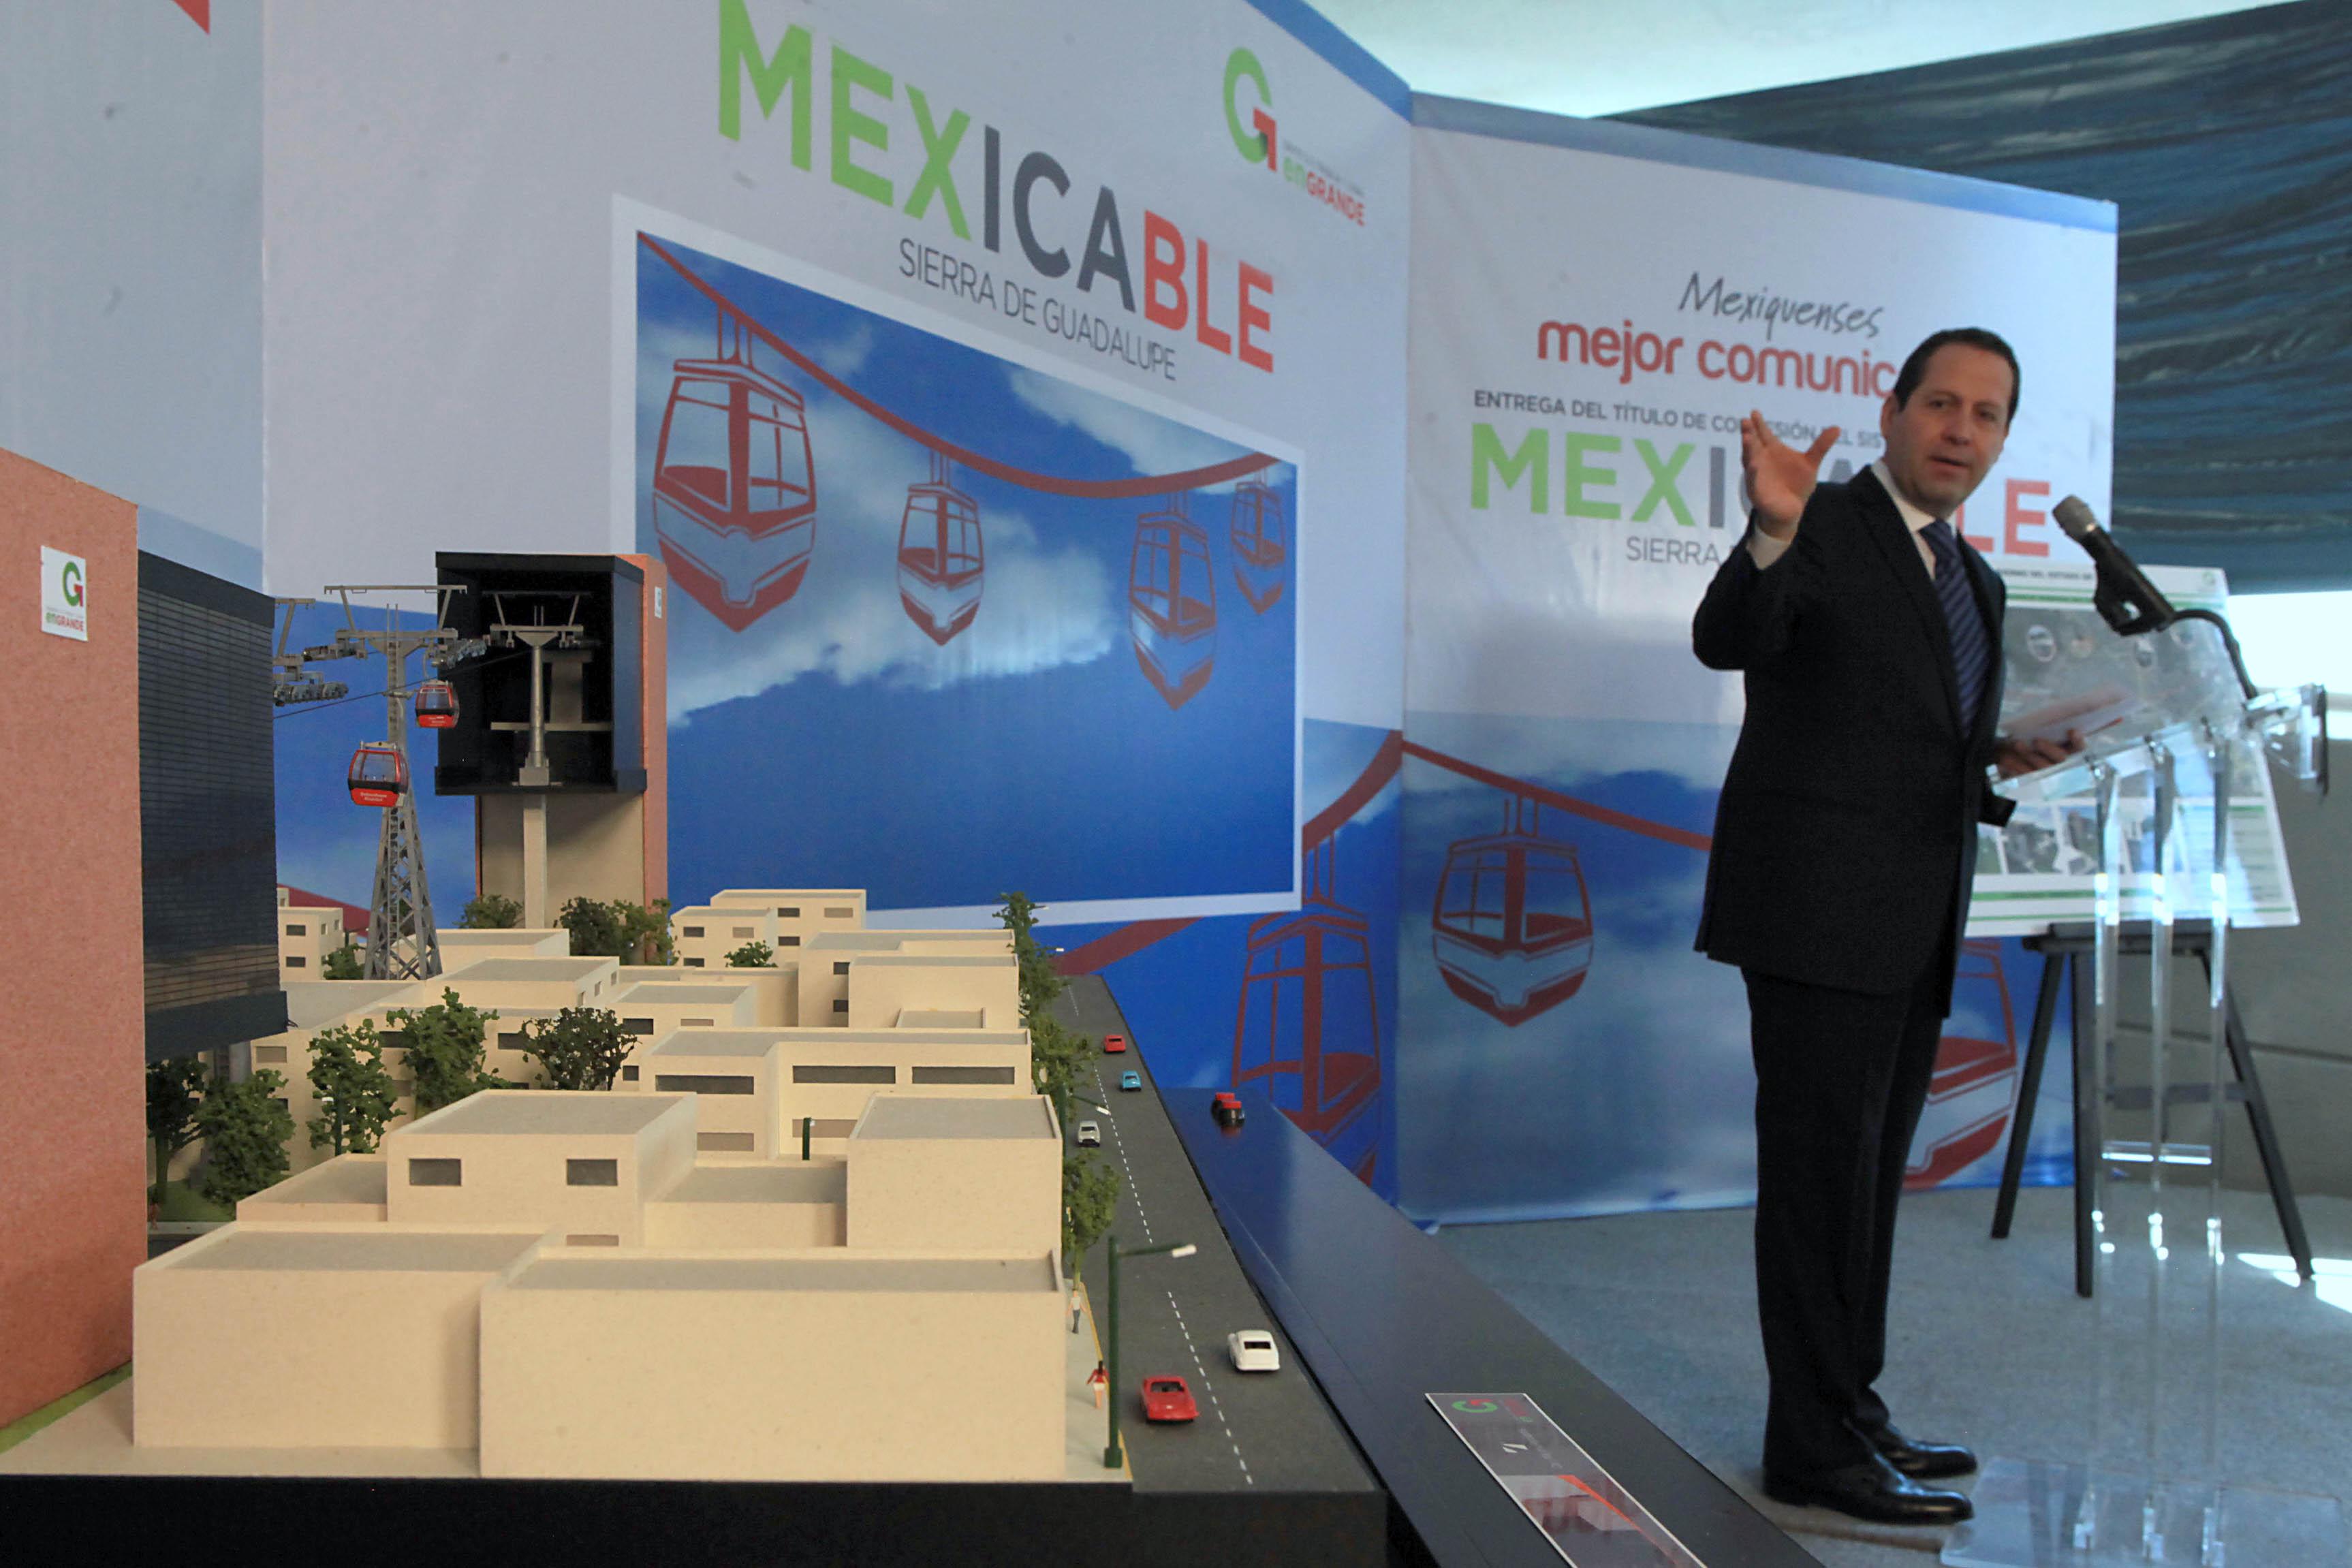 Mexicable. El teleférico de Ecatepec.